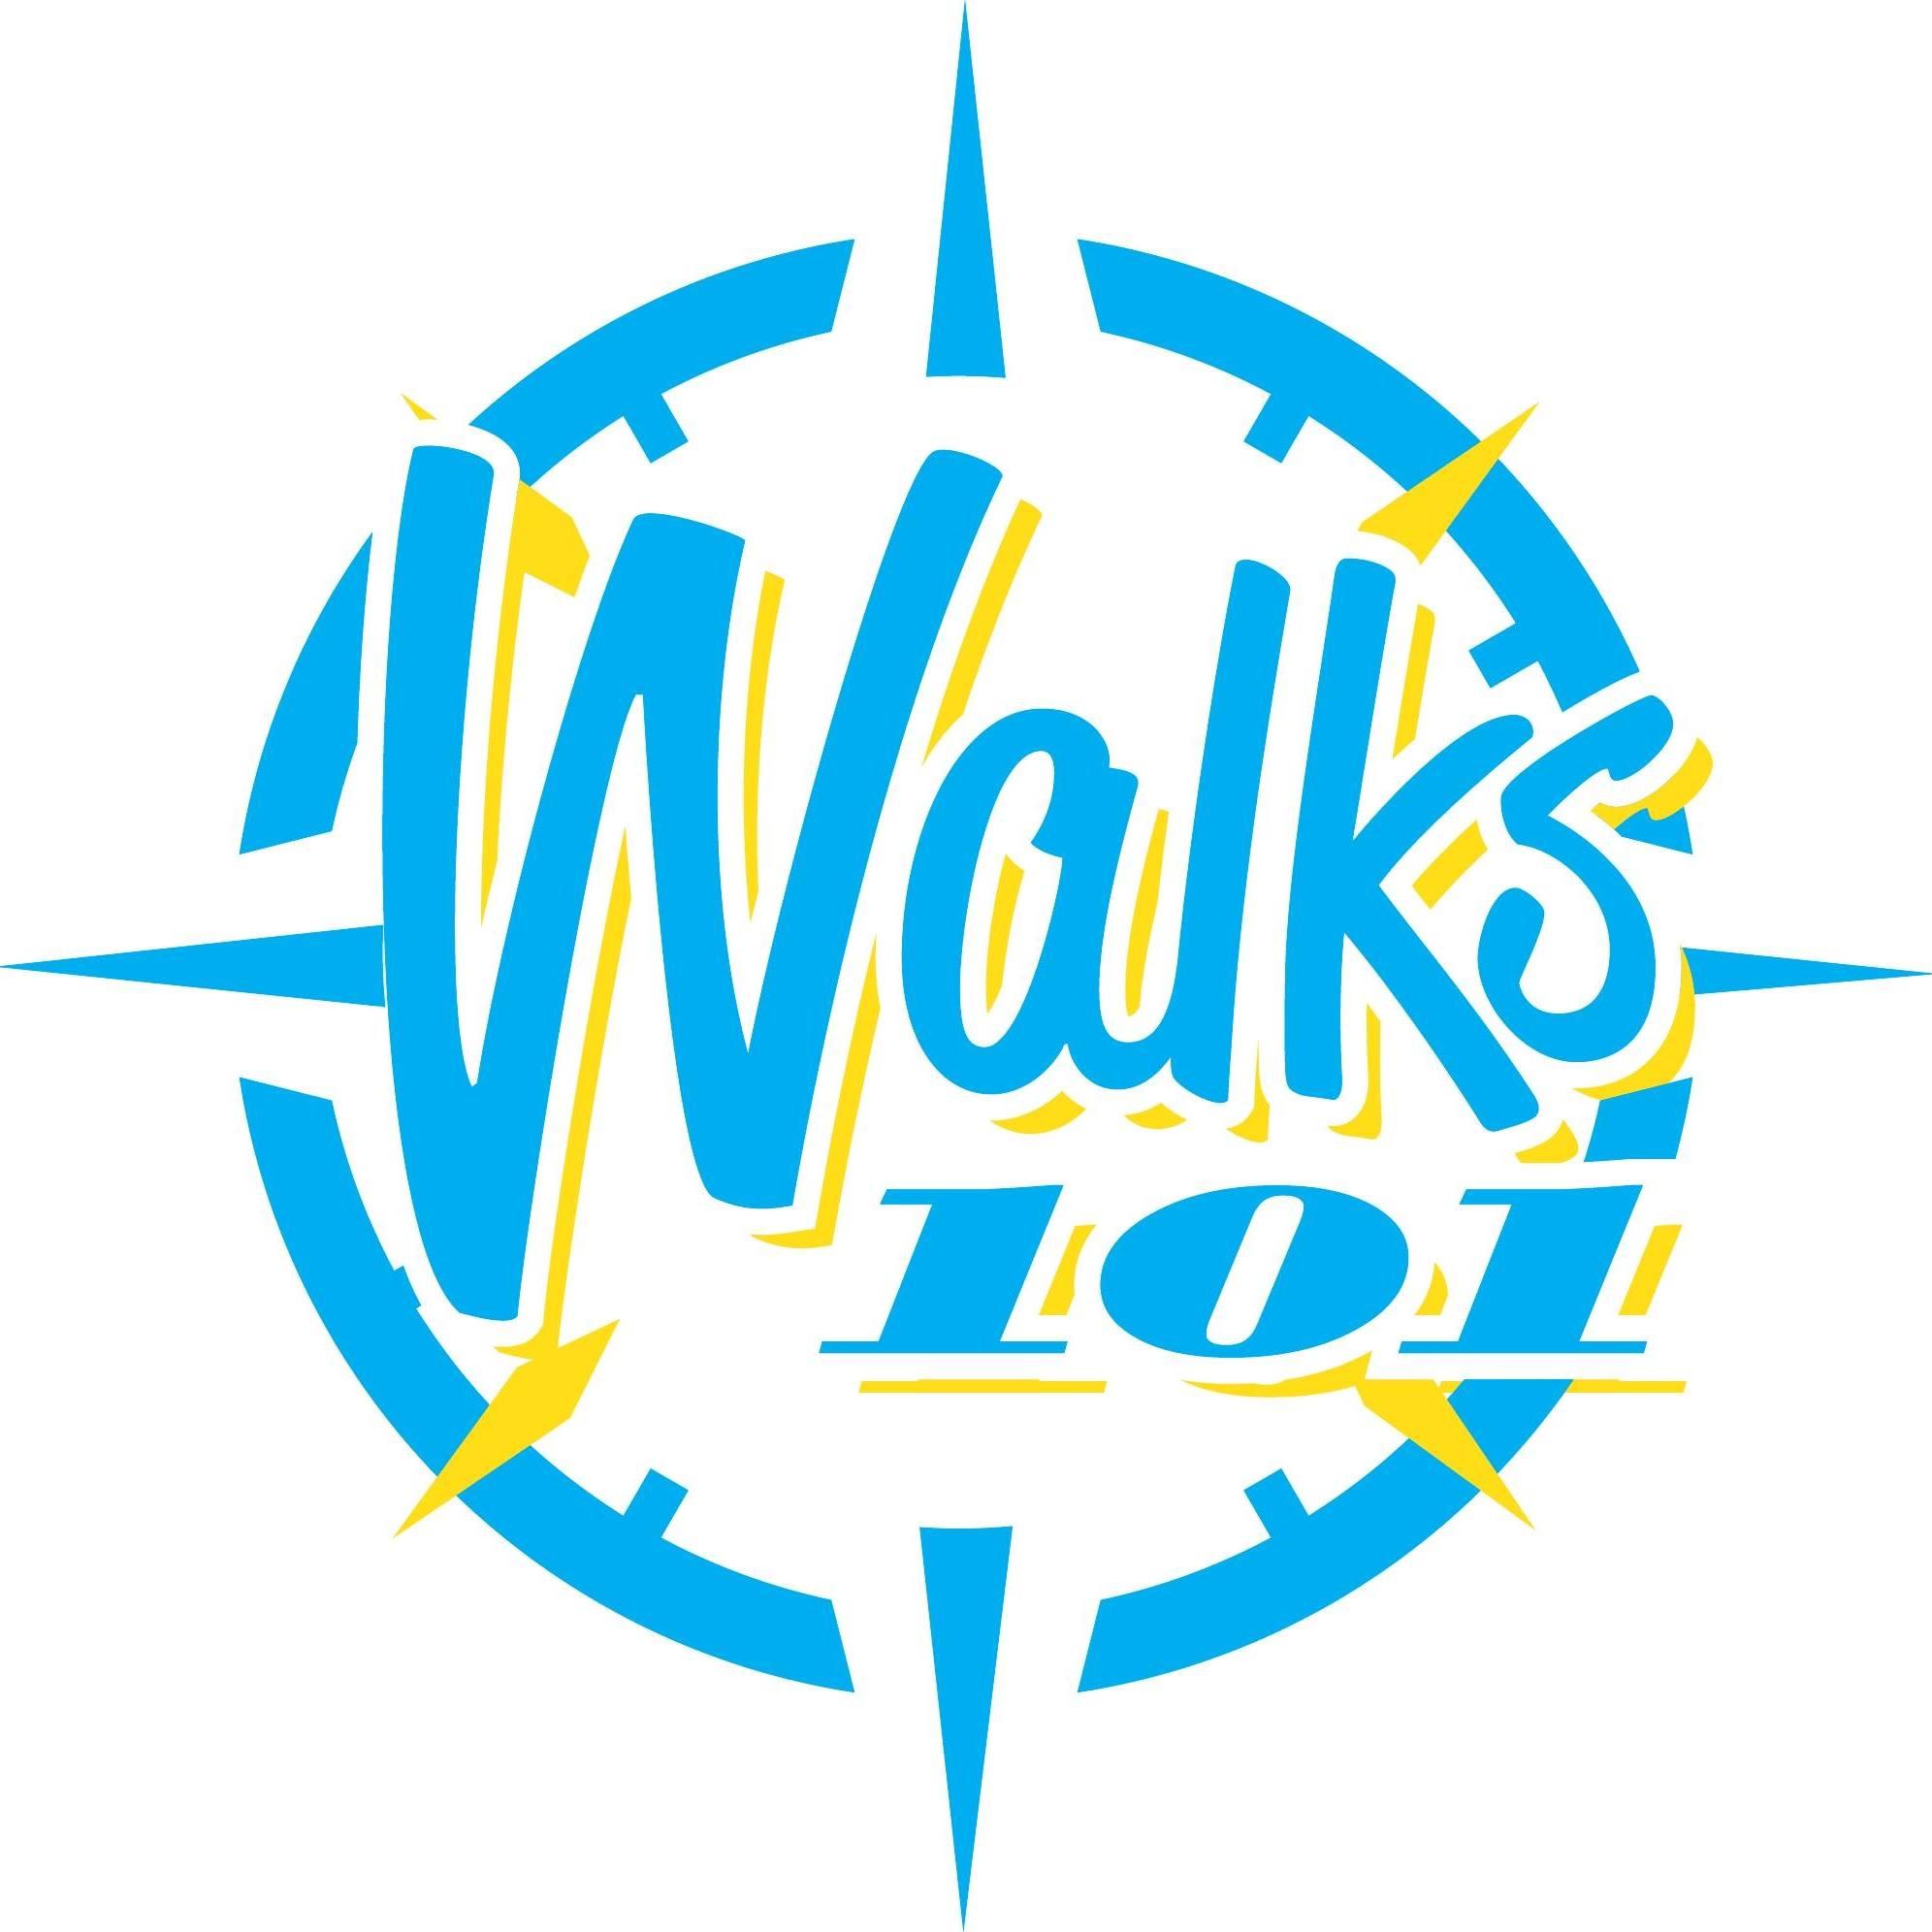 John from Walk 101